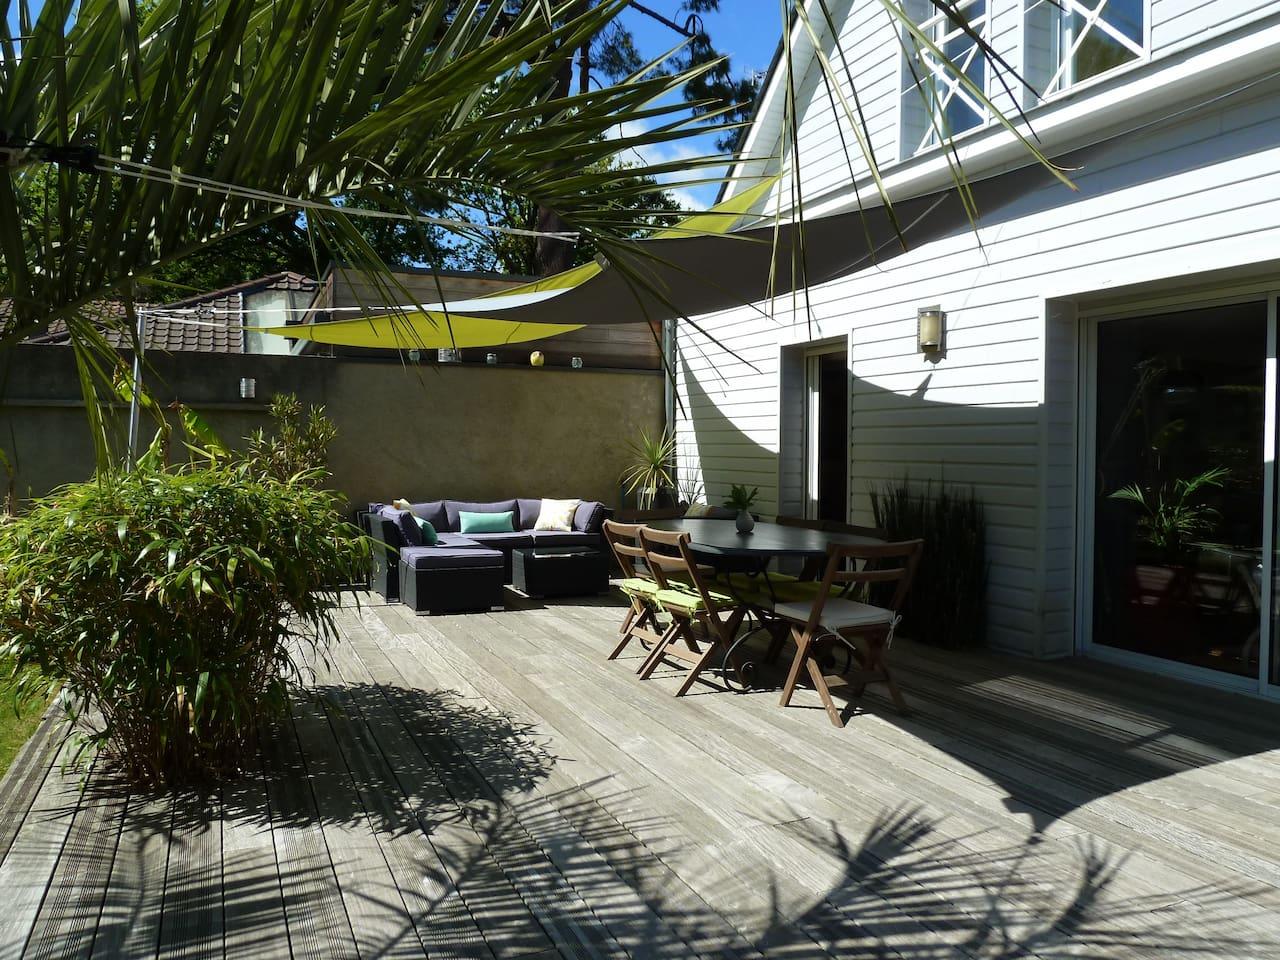 Terrasse avec coin repas et salon de jardin au sud sur jardon